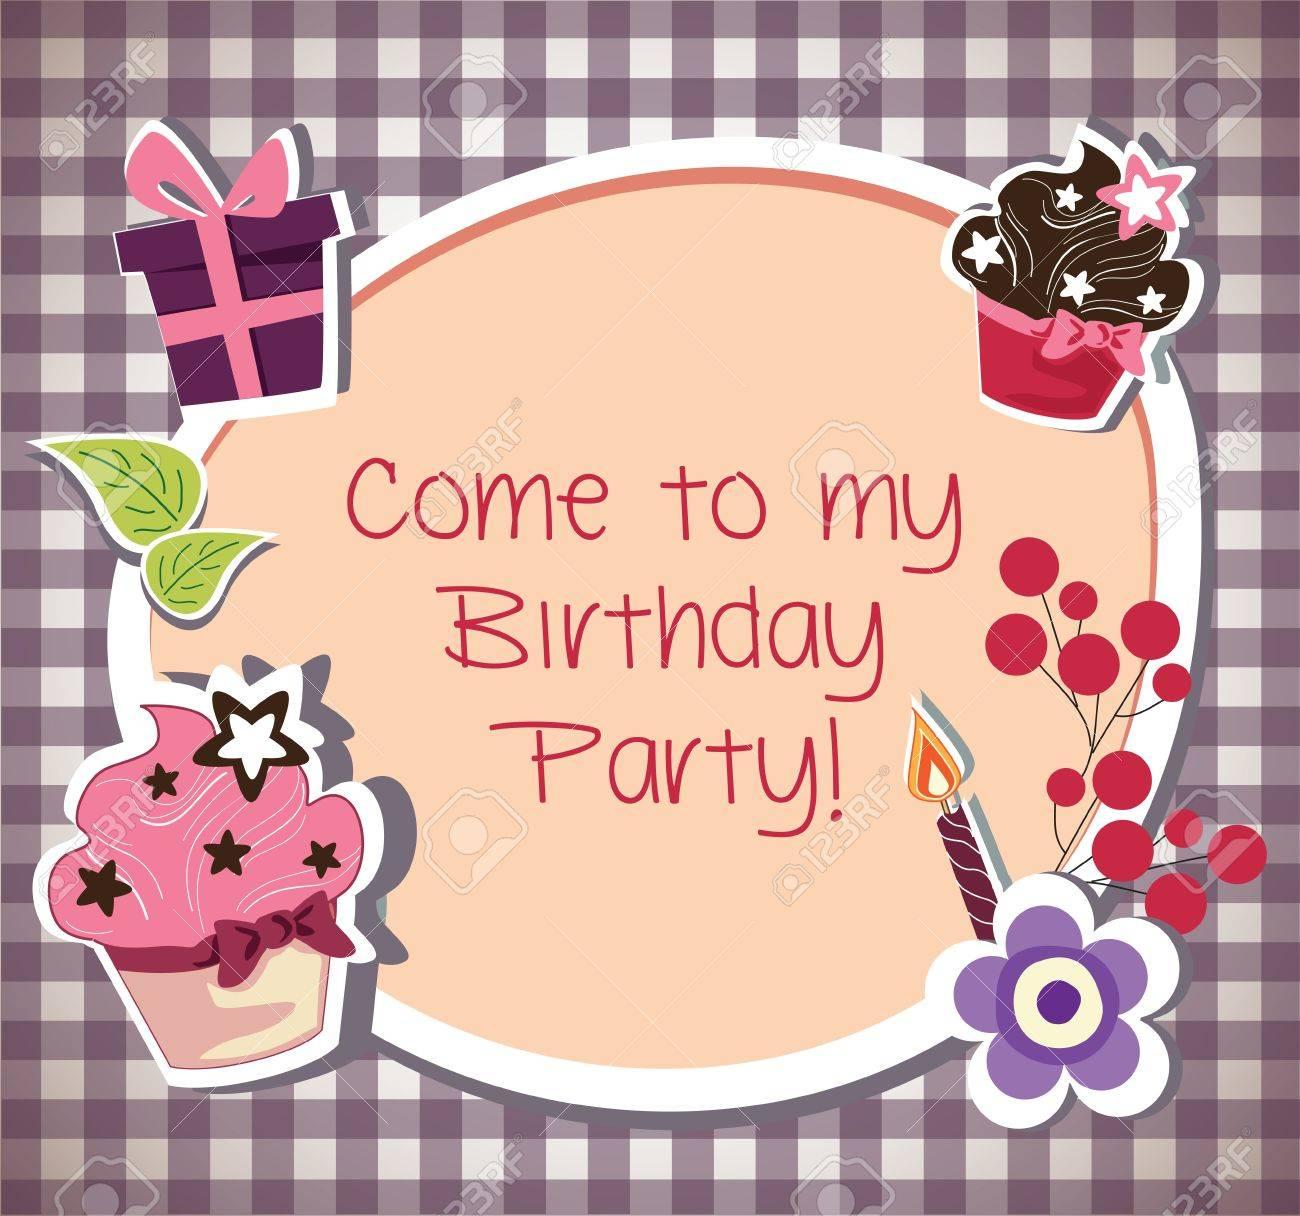 Birthday Party Invitation Card Royalty Free Cliparts, Vectors, And ...